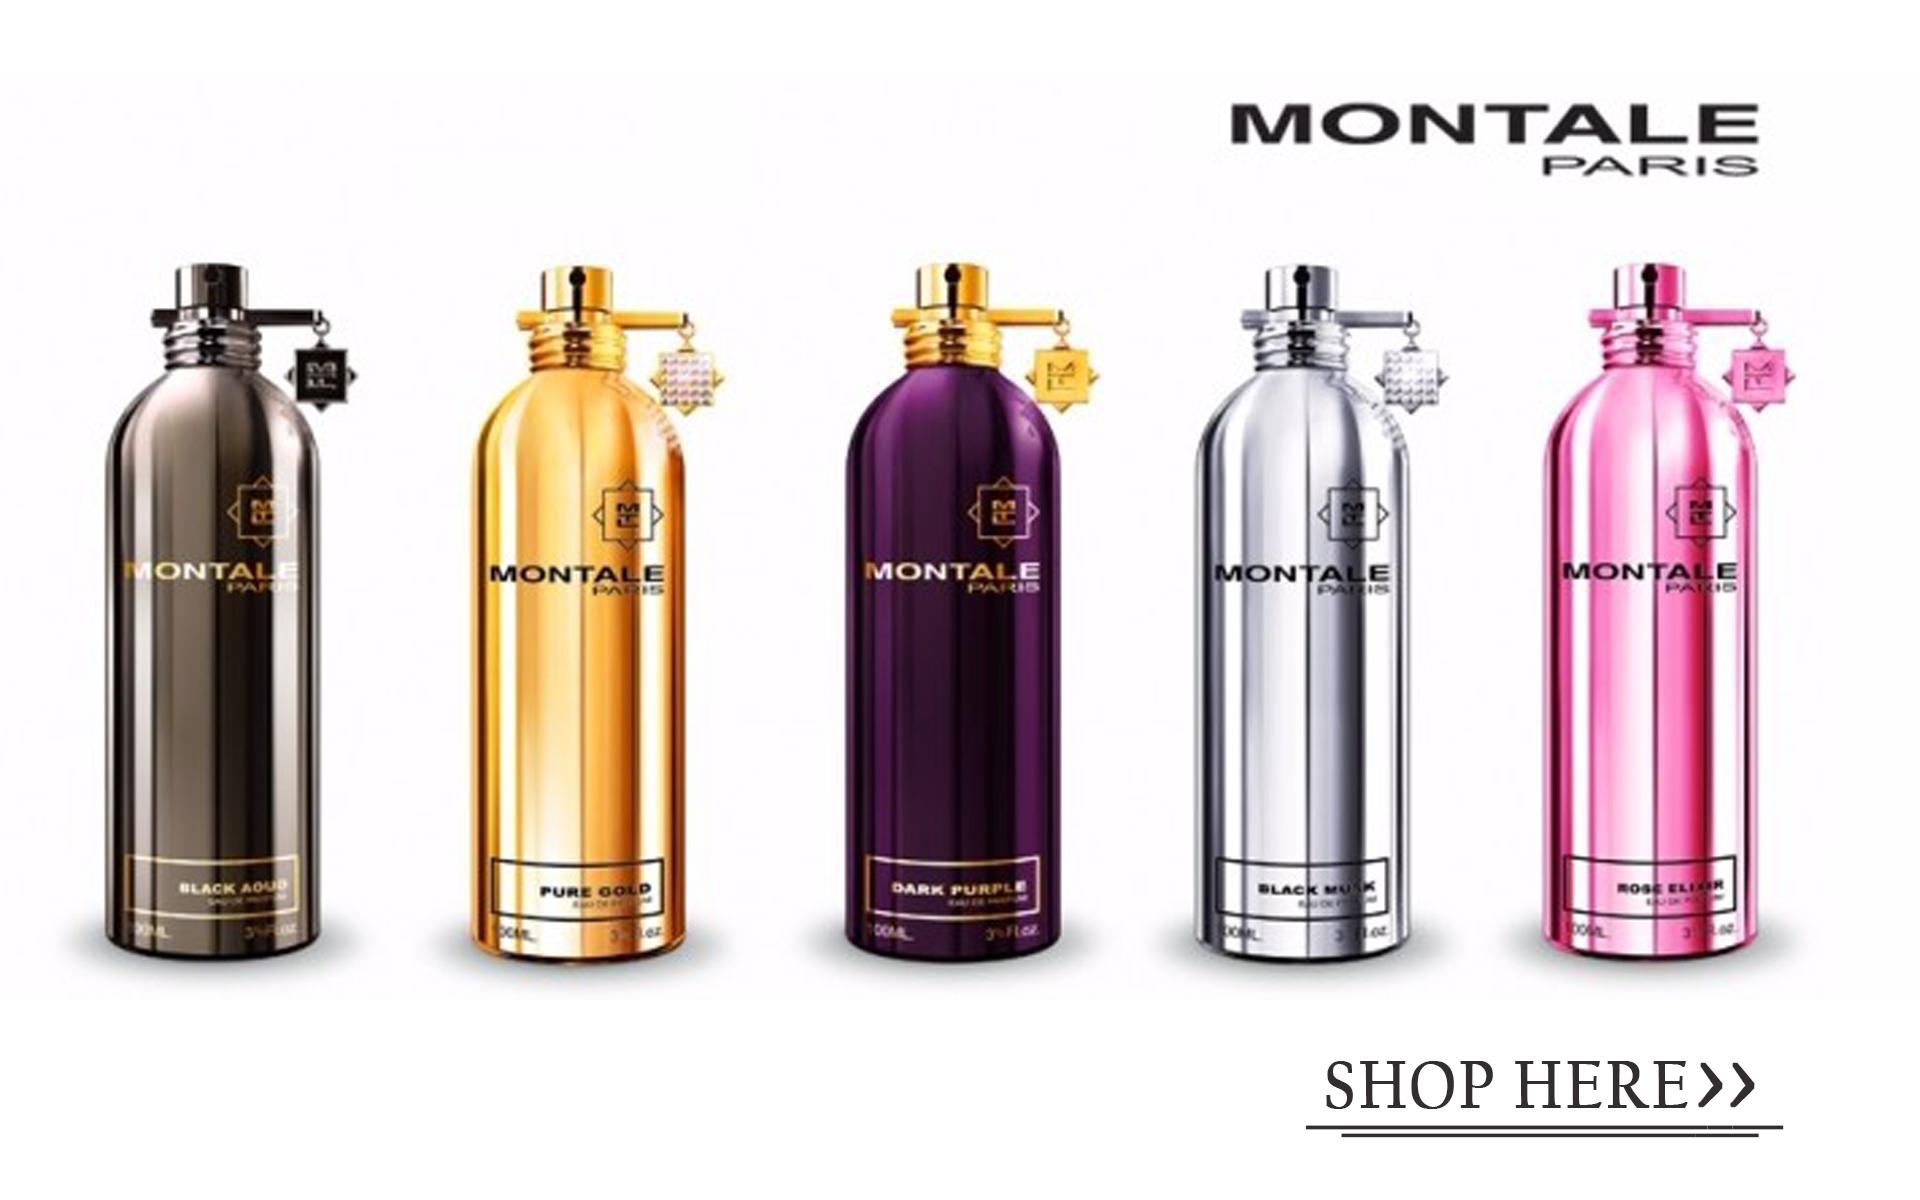 Montale Perfumes